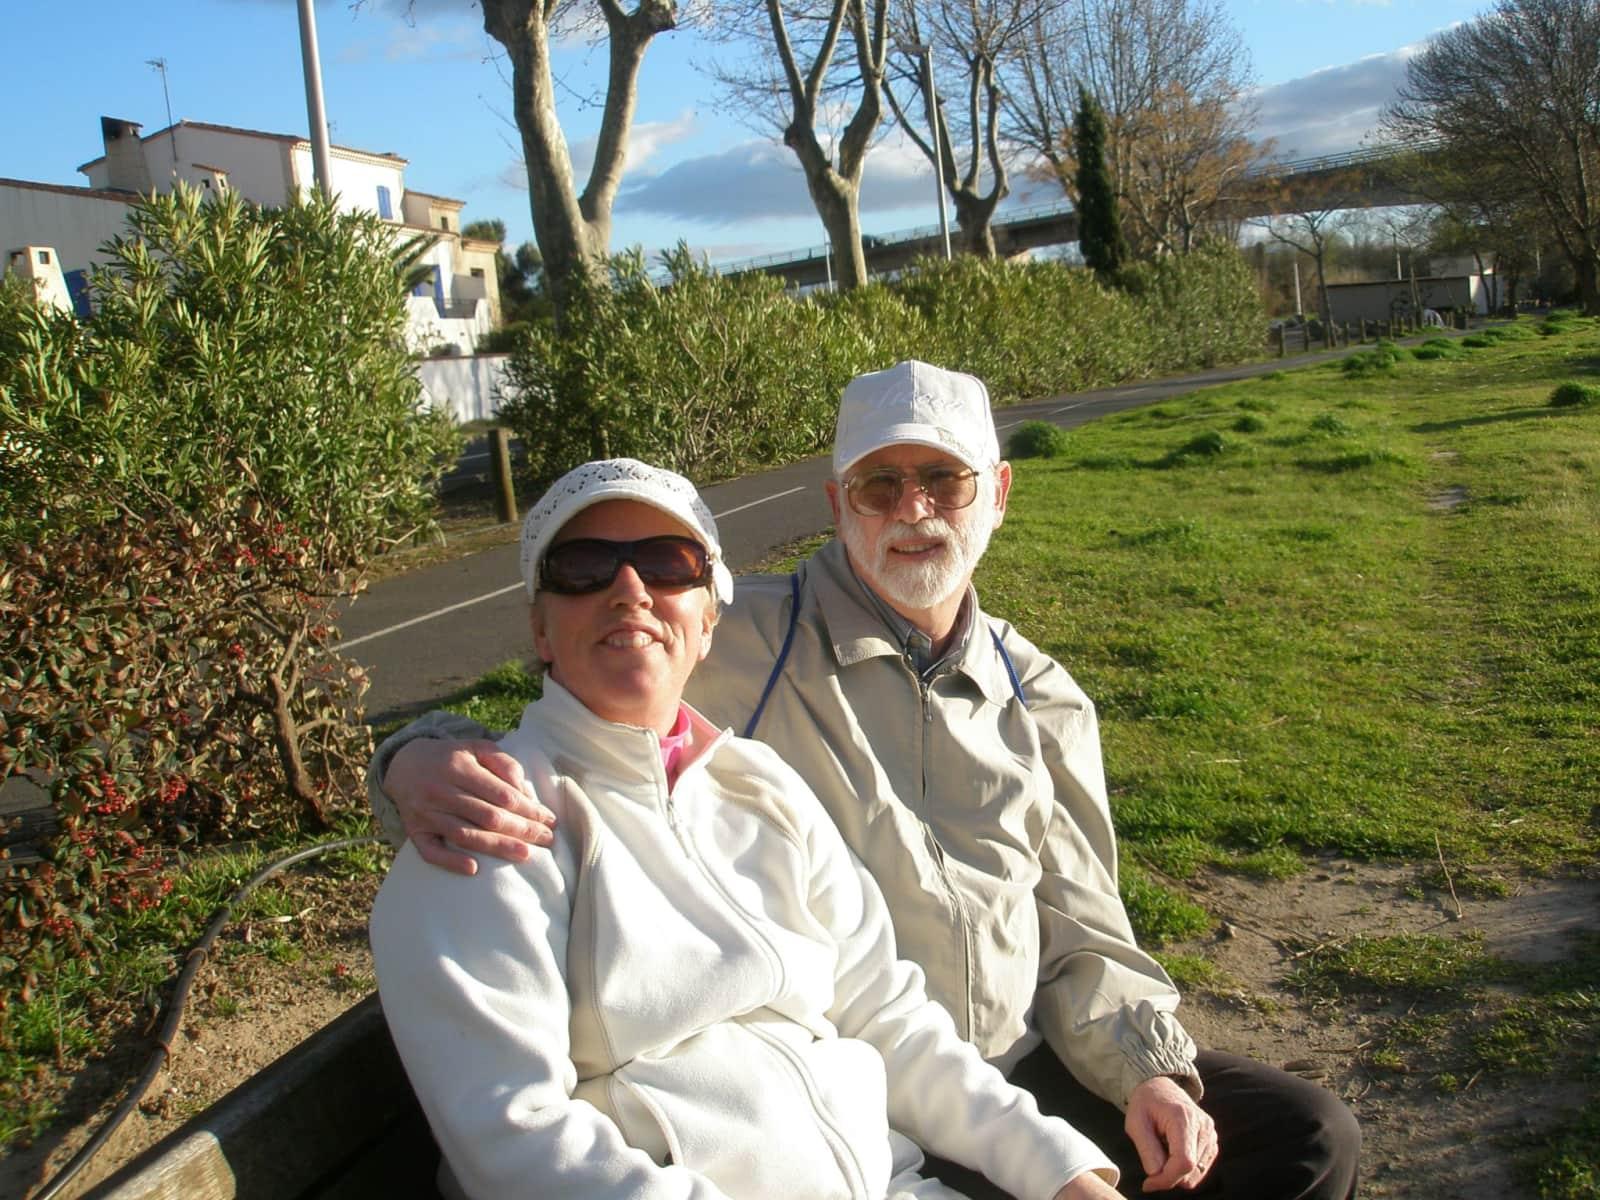 Cheryl & Bill from Olympia, Washington, United States